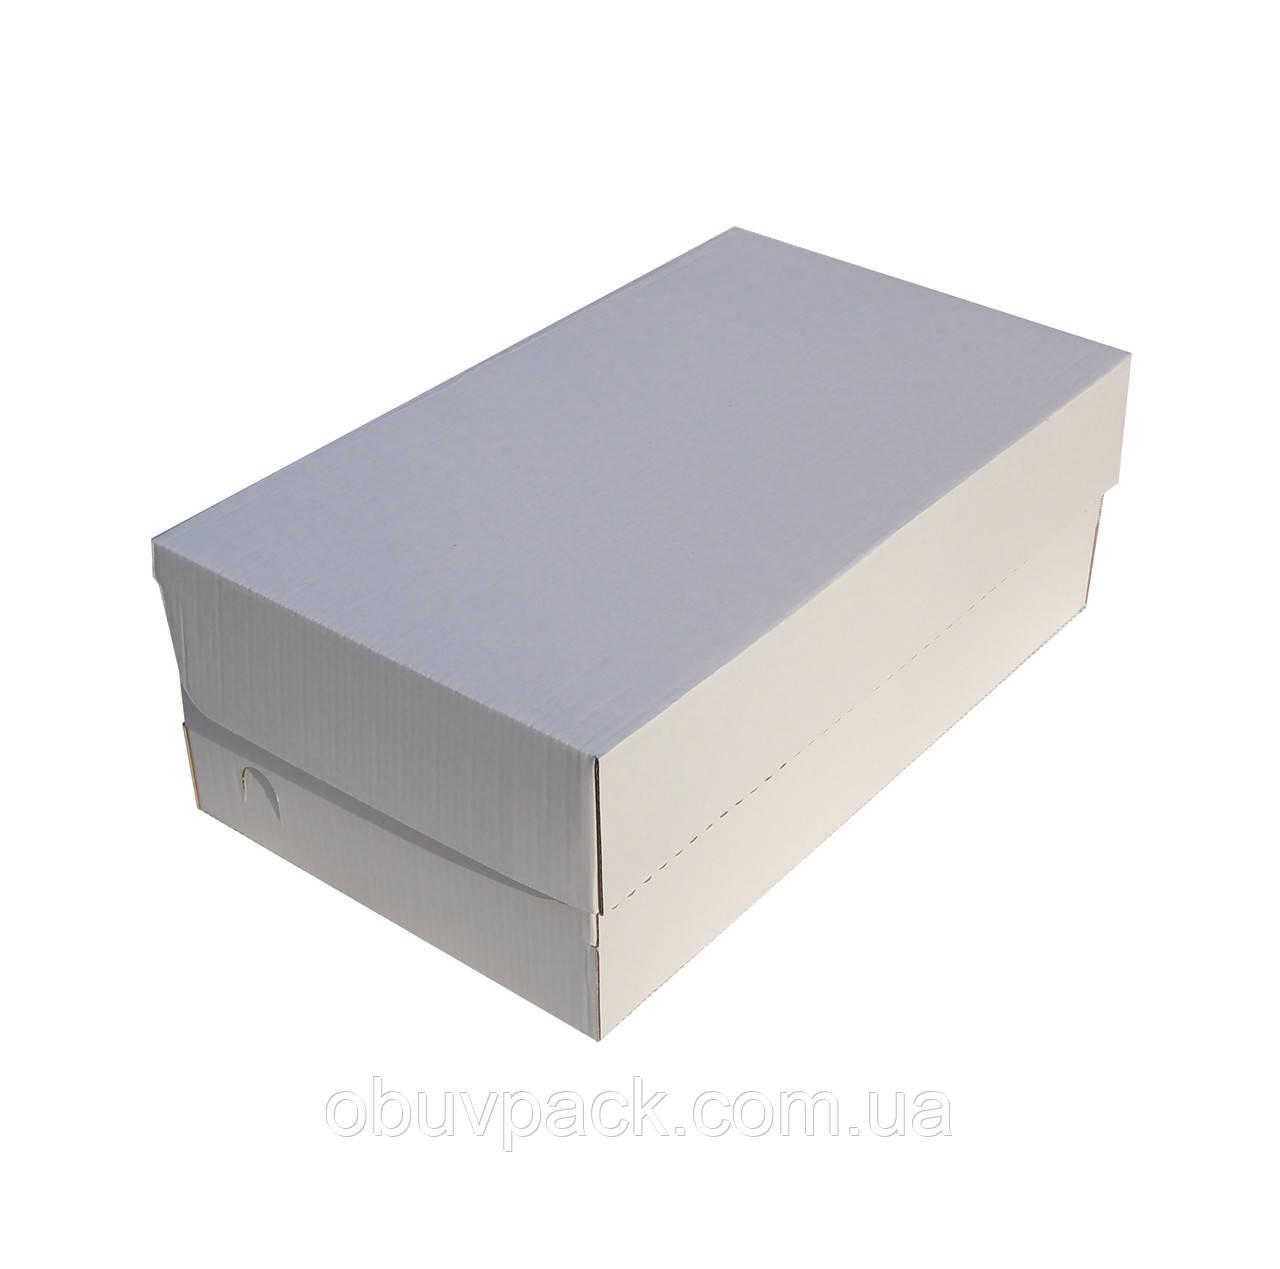 Коробка обувная белая